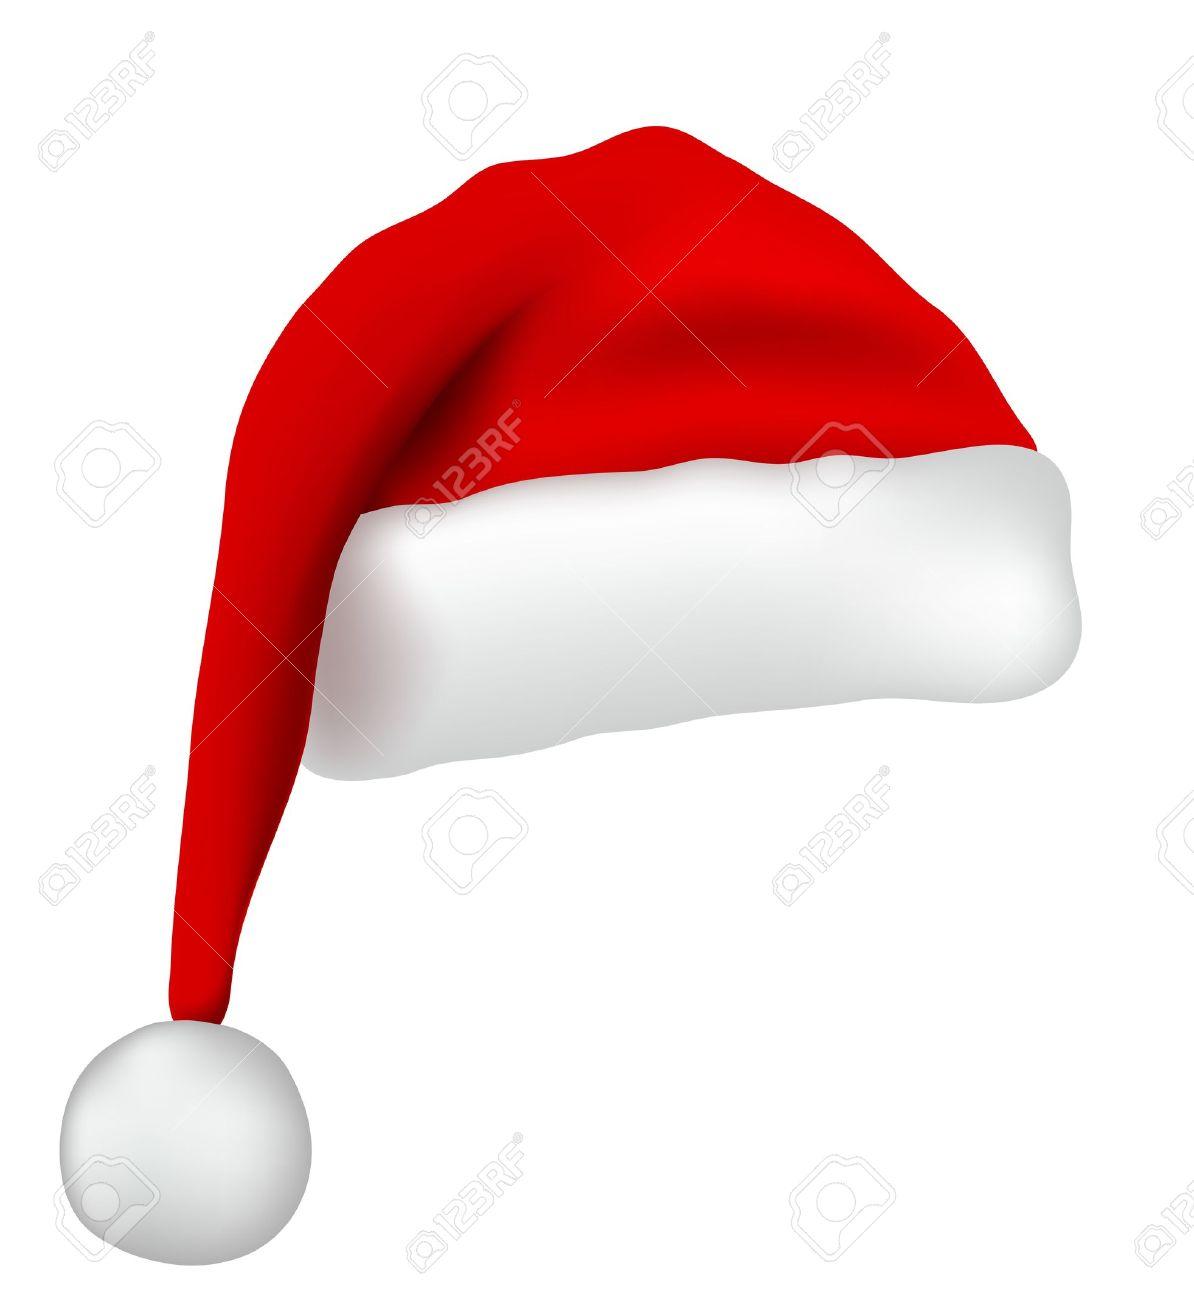 santa claus hat royalty free cliparts vectors and stock rh 123rf com blue santa claus hat clipart Black Santa Claus